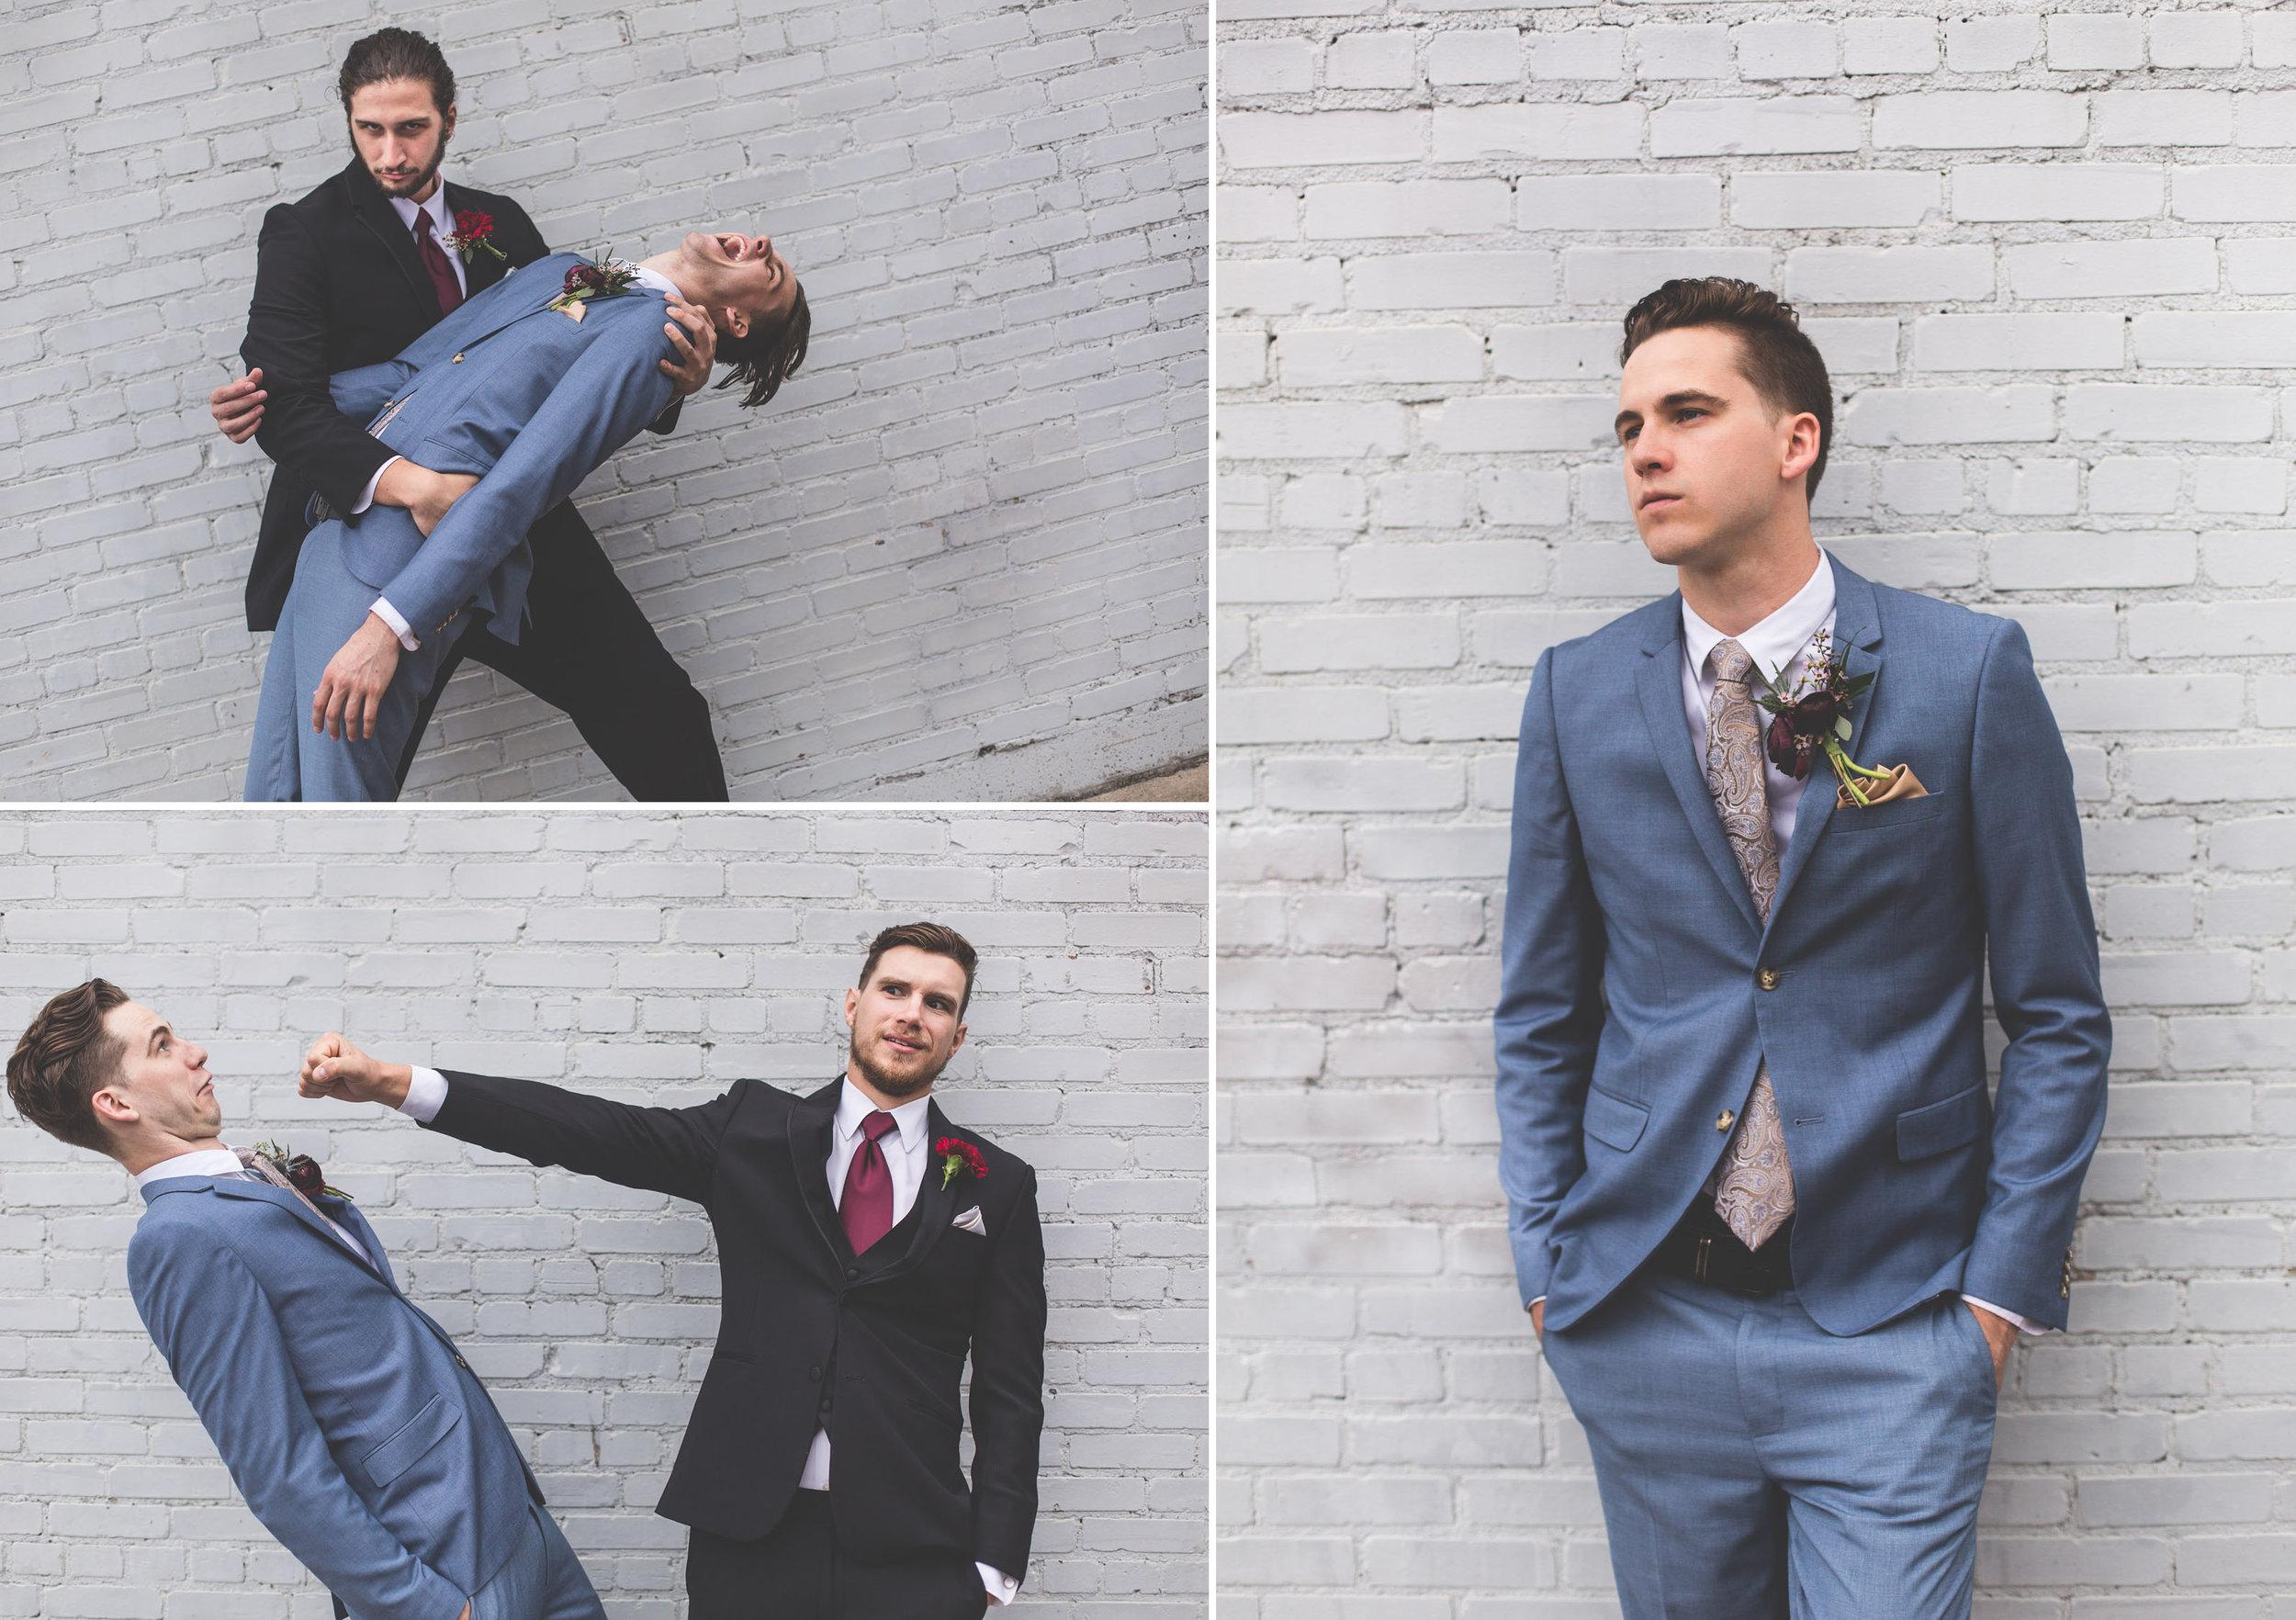 Adam-Szrmack-The-Glass-Factory-Wedding-54.jpg